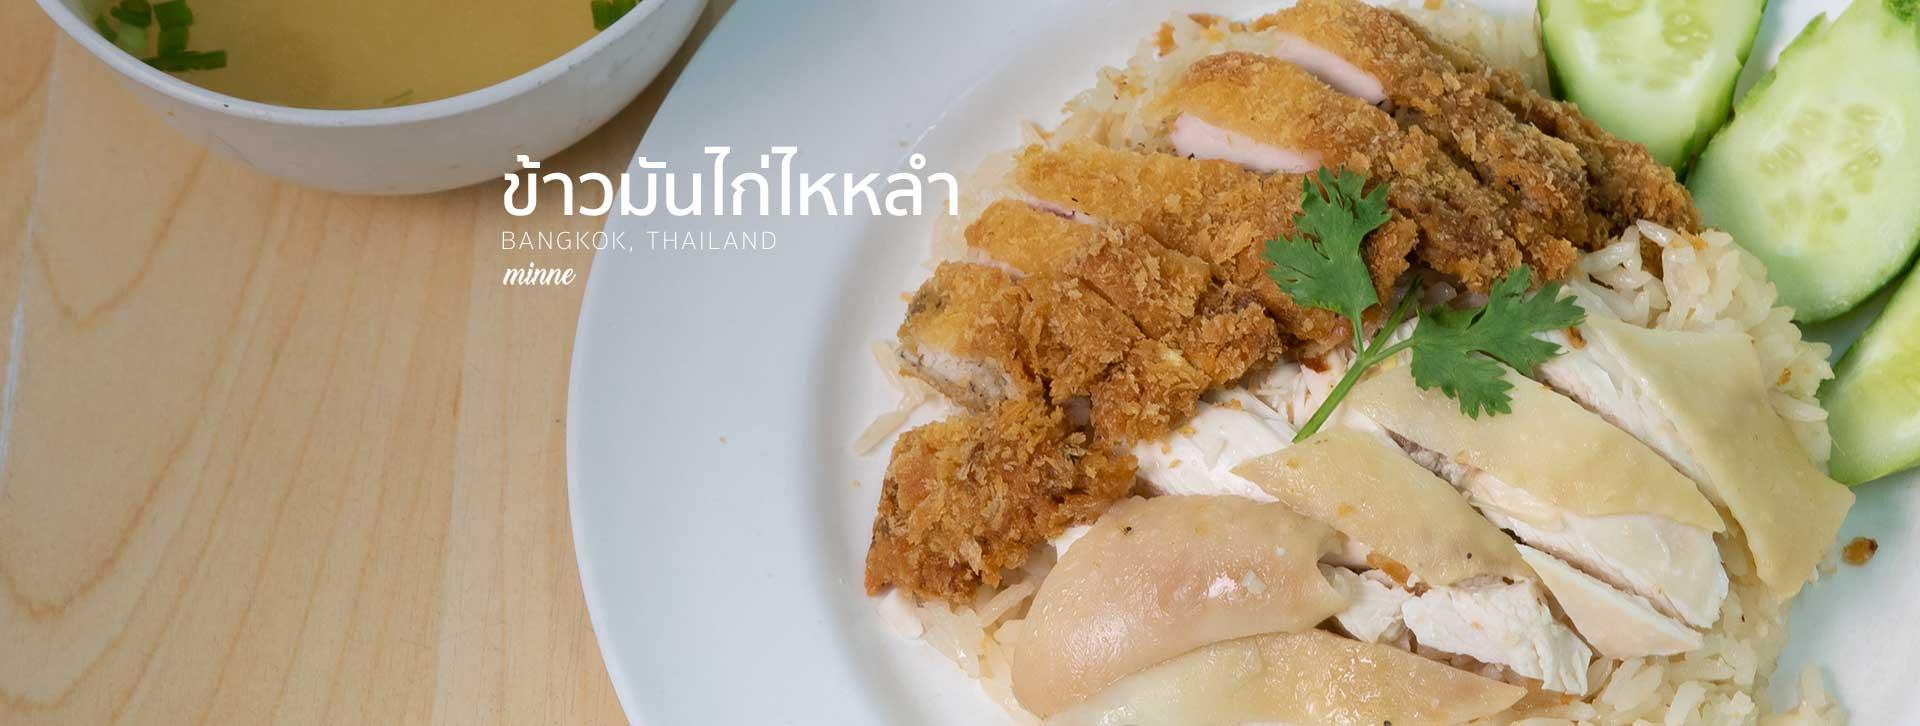 minnesnap khao mun kai hailum bang sri muang hainanese chicken rice long cover